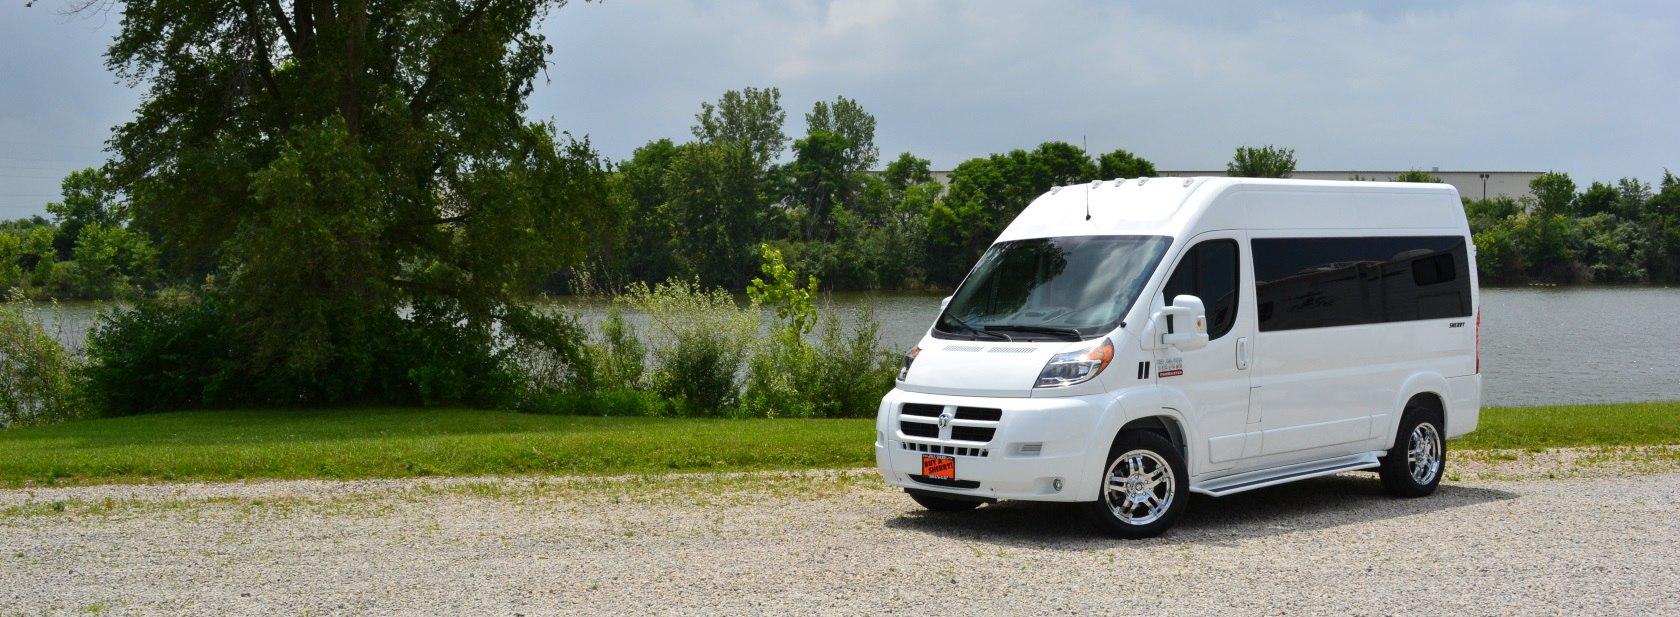 explorer conversion vans for sale paul sherry conversion vans. Black Bedroom Furniture Sets. Home Design Ideas